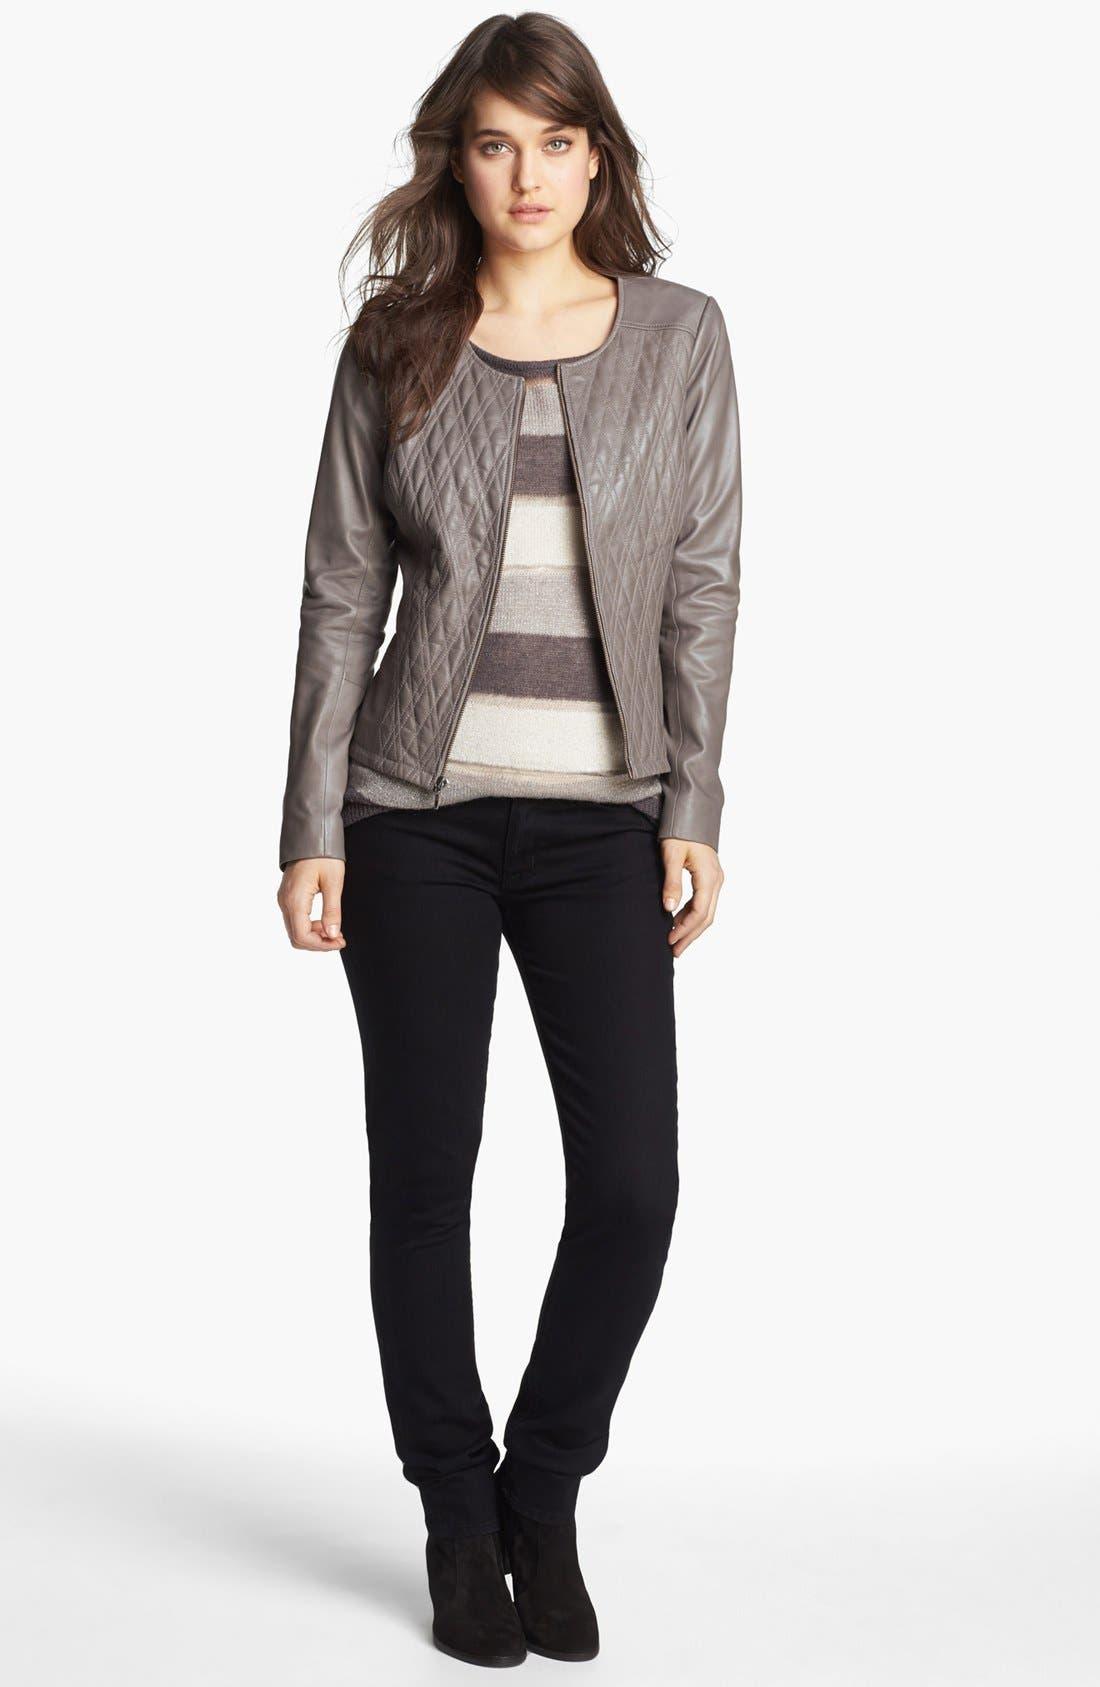 Alternate Image 1 Selected - Hinge Jacket, Sweater & Hudson Jeans Skinny Jeans